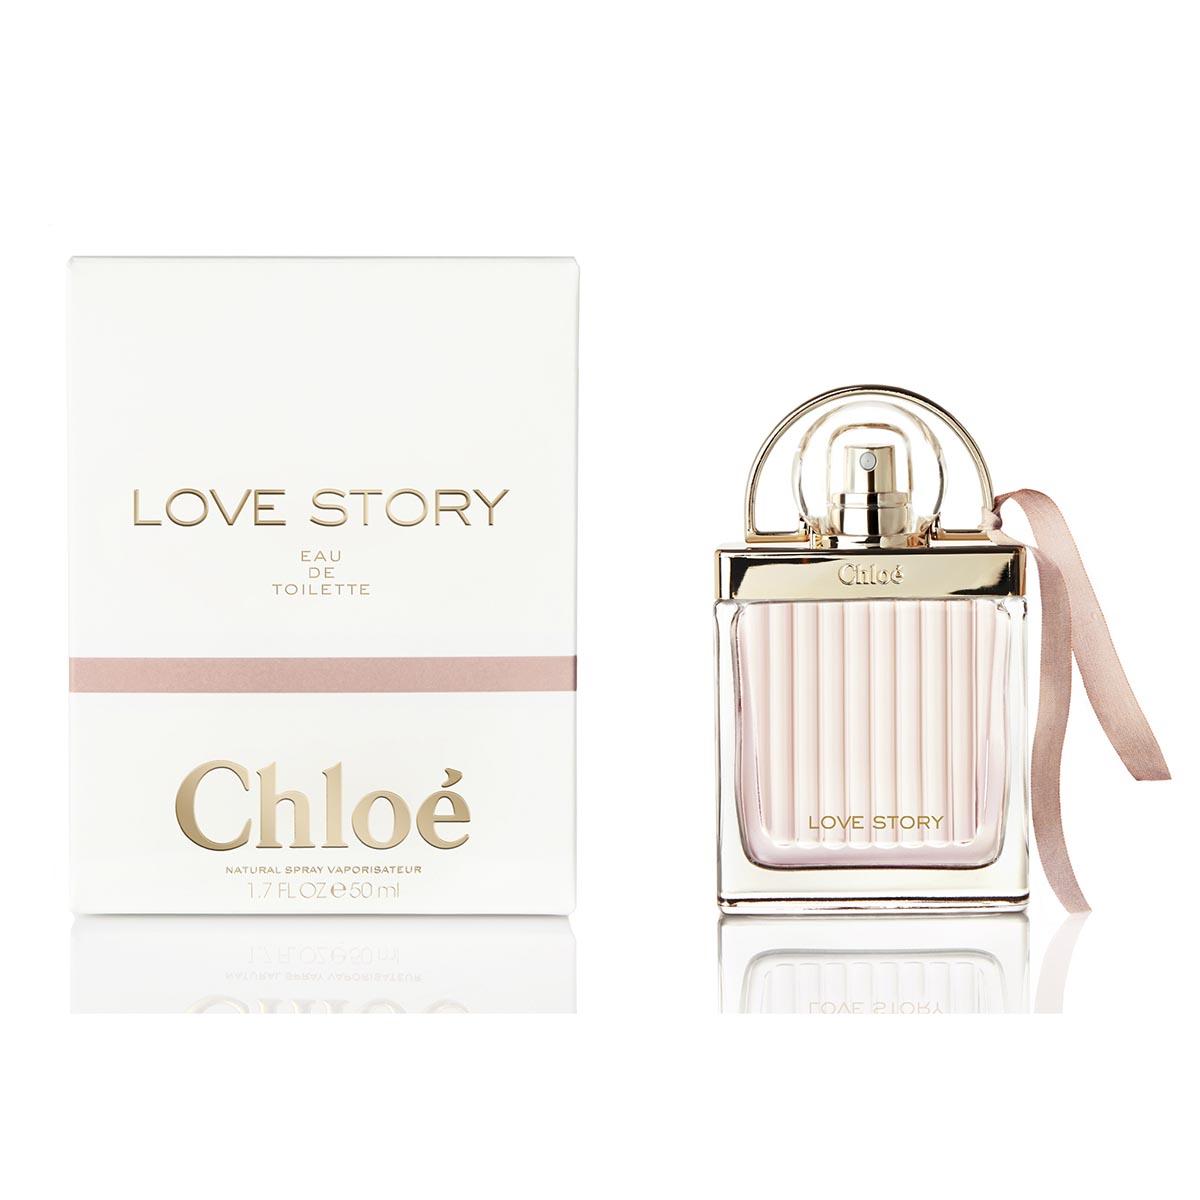 Chloe love story eau de toilette 75ml vaporizador